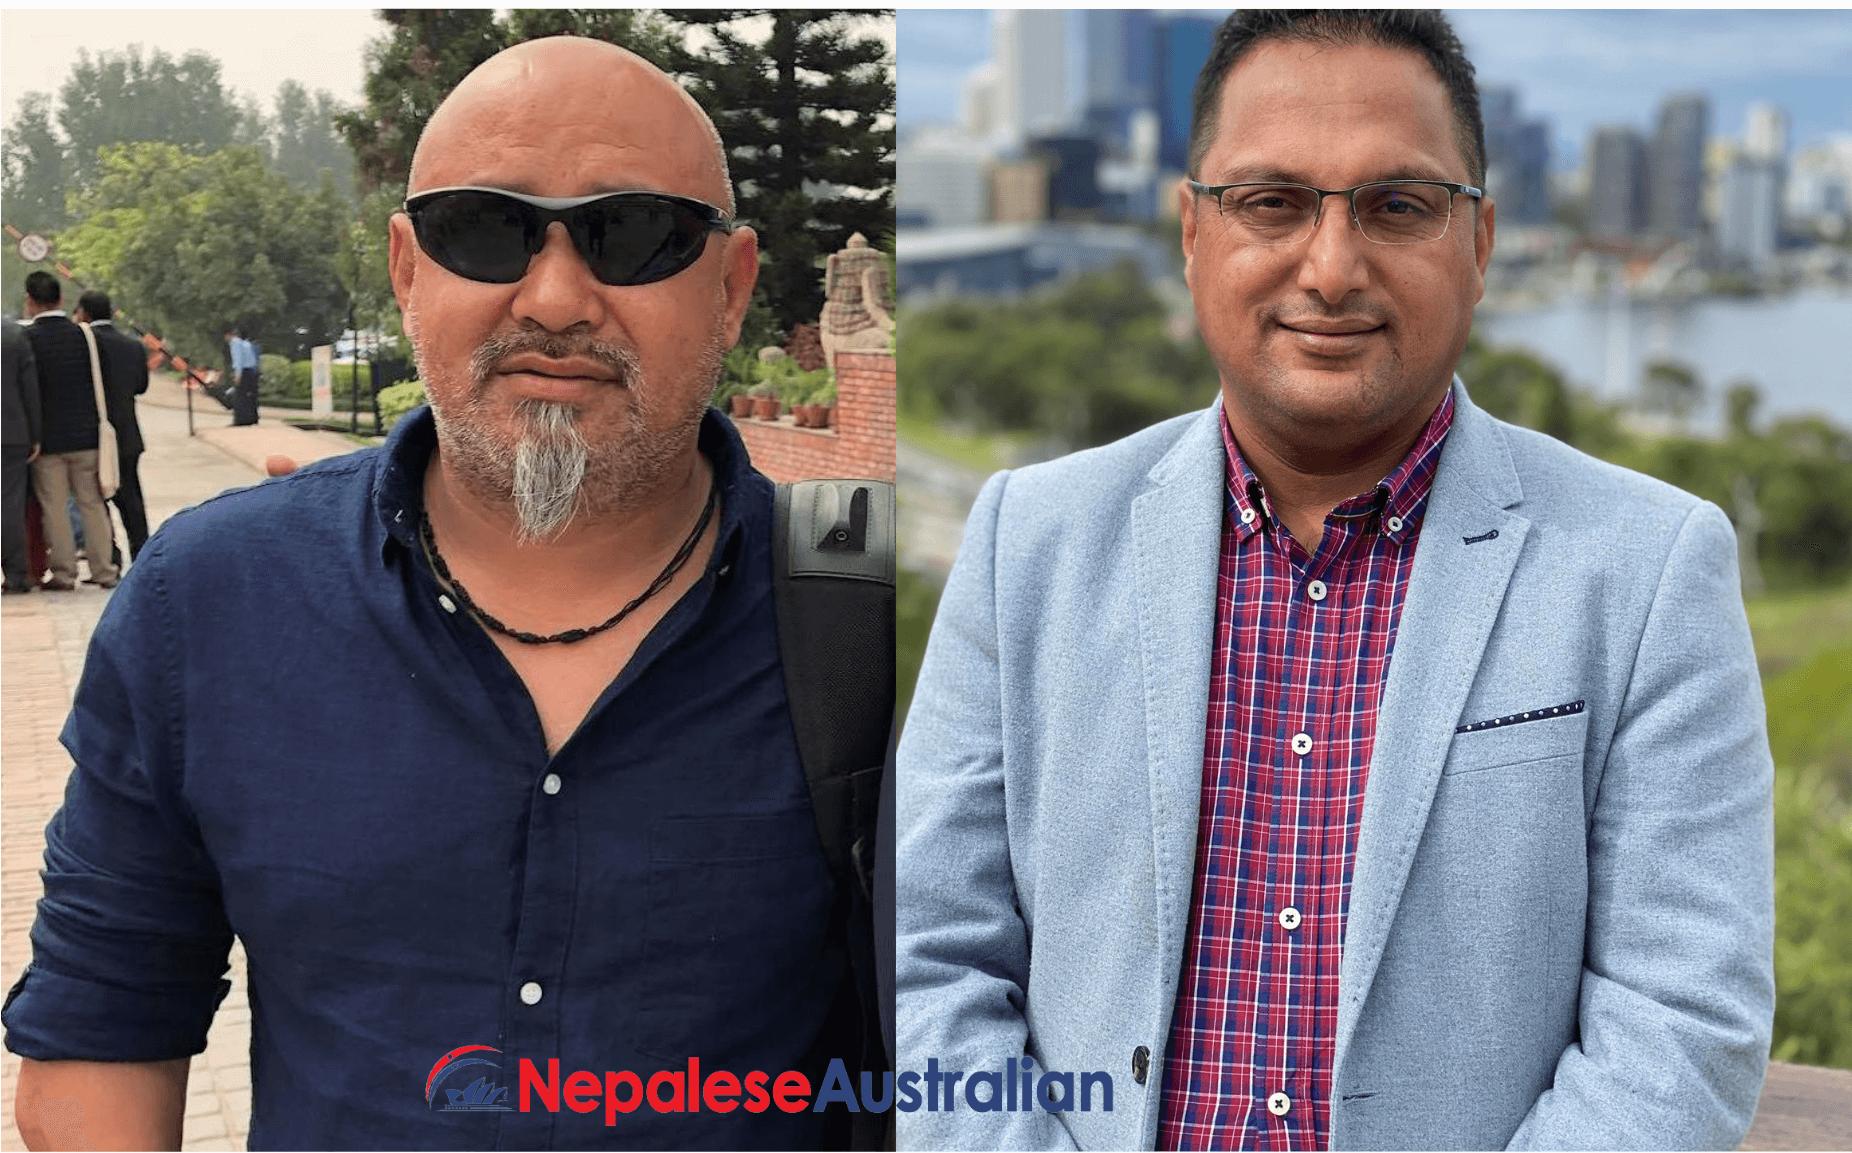 NRNA ICC Sports central advisor Subash Shrestha (Left) and BhupalSitoula (Right), the outgoing NRNA Oceania sports coordinator